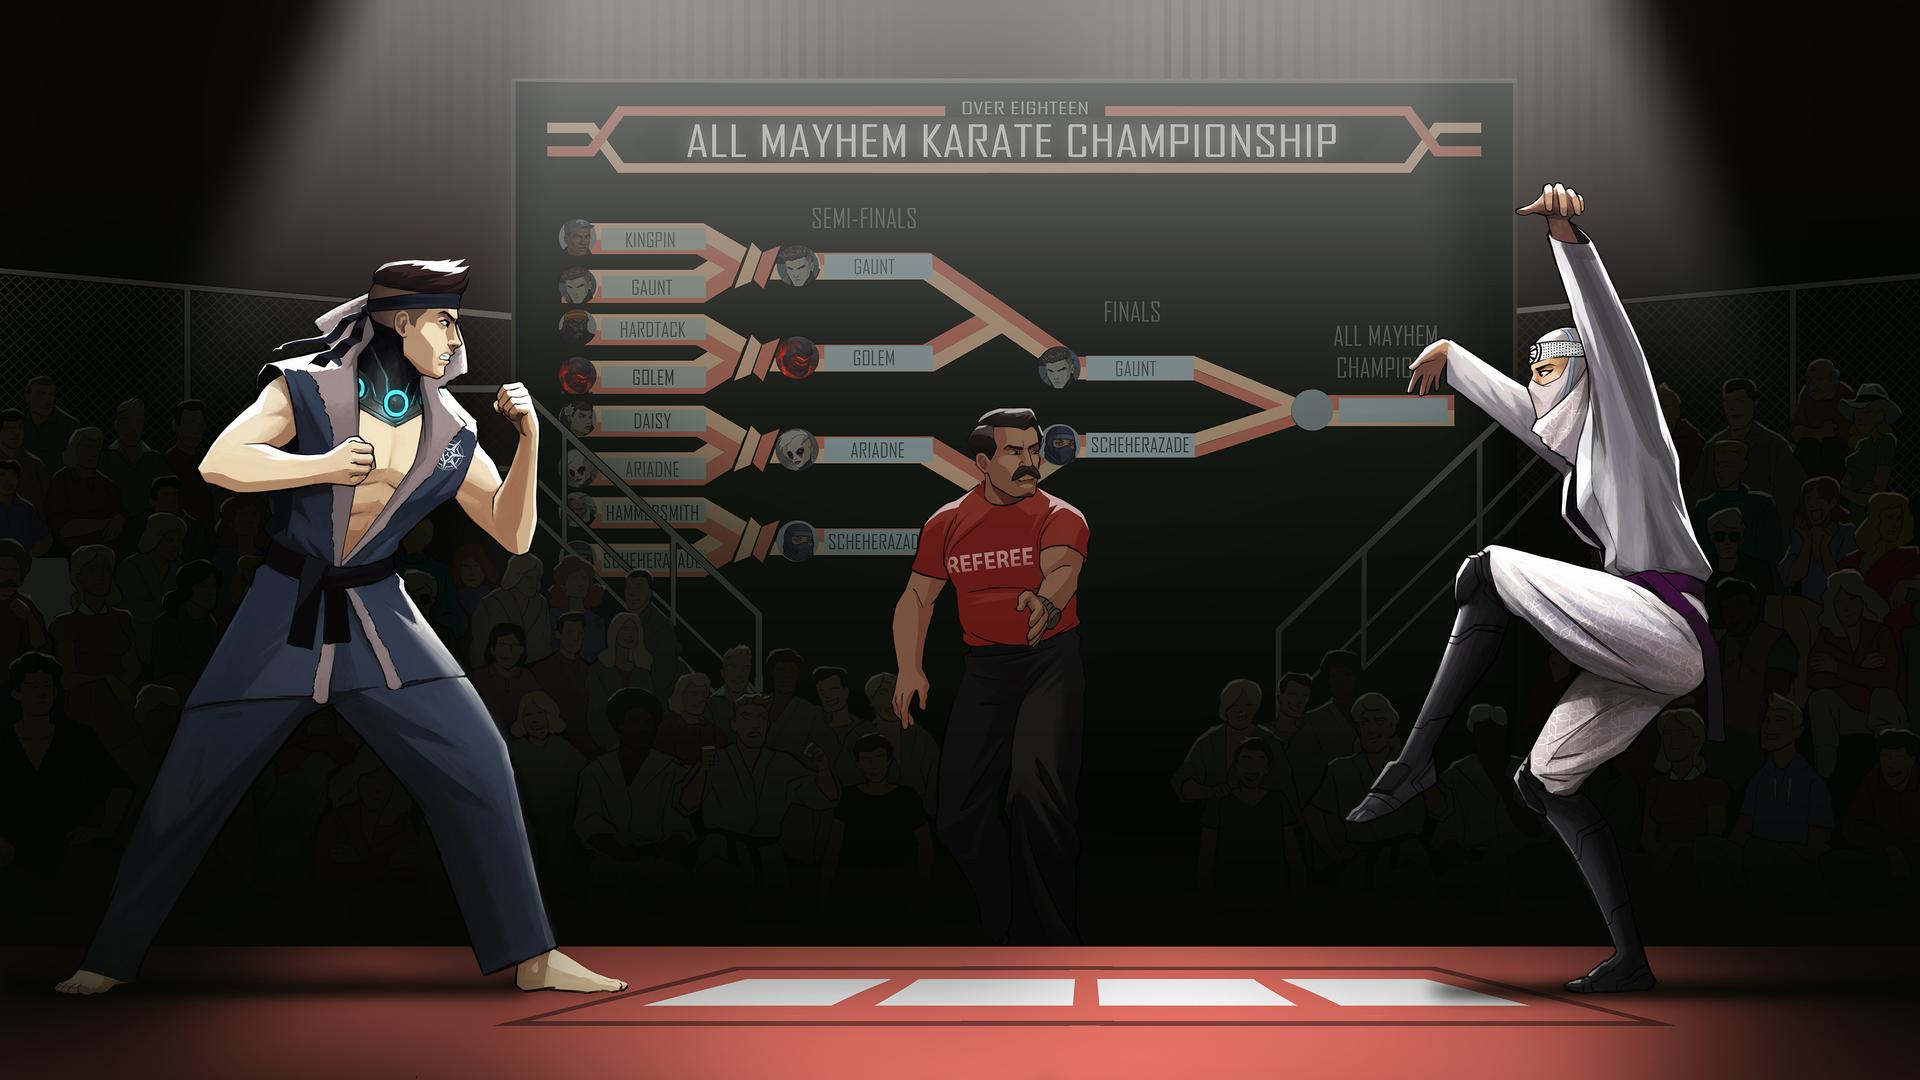 Agents Of Mayhem Artwork Hd Games 4k Wallpapers Images: Agents Of Mayhem Full HD Wallpaper And Background Image